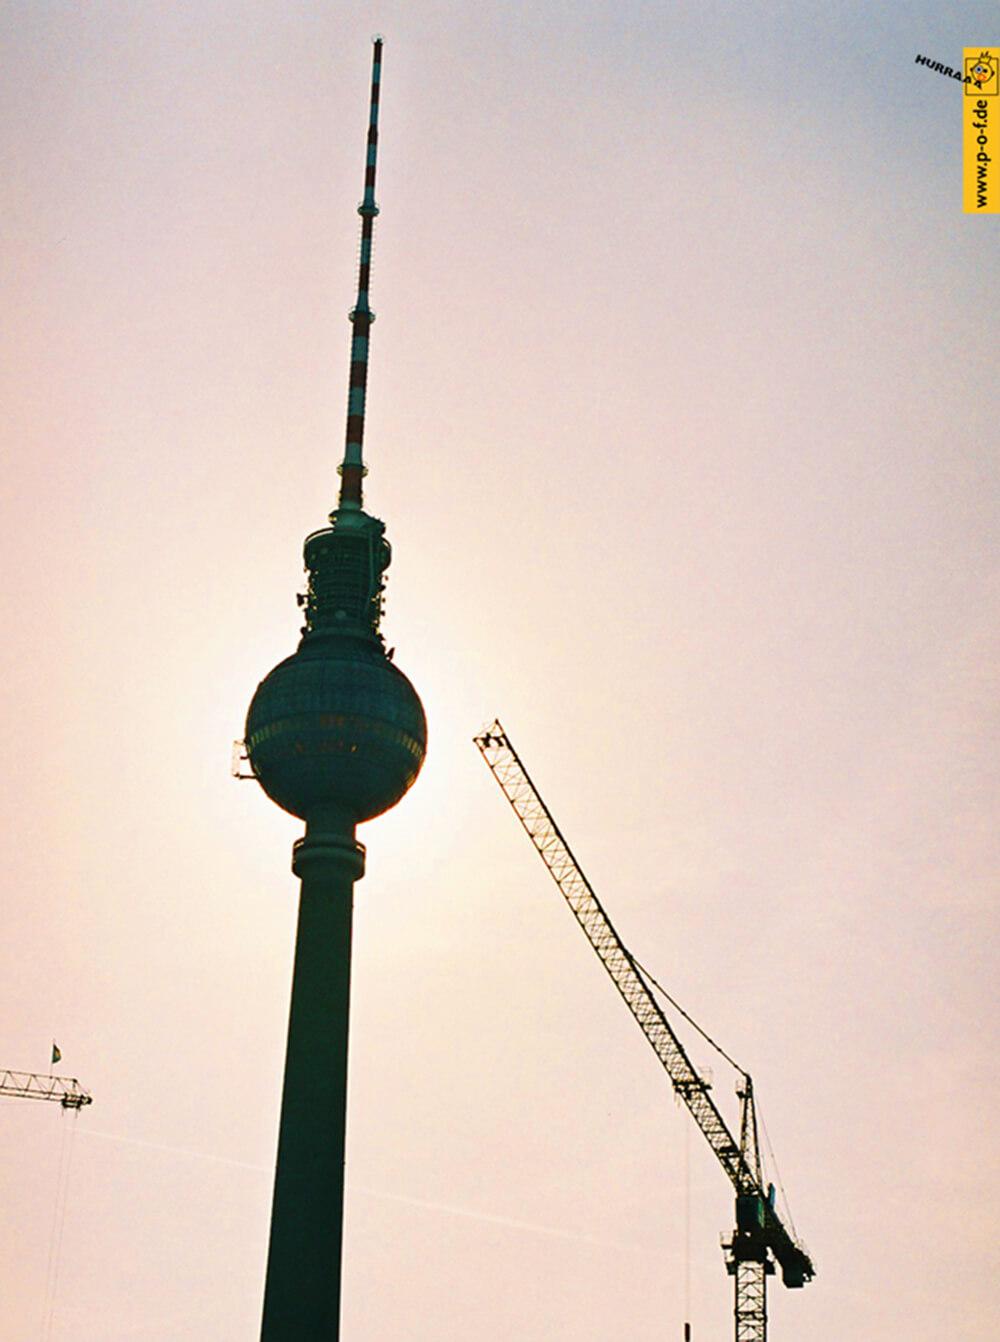 Fernsehturm im Sonnenaufgang